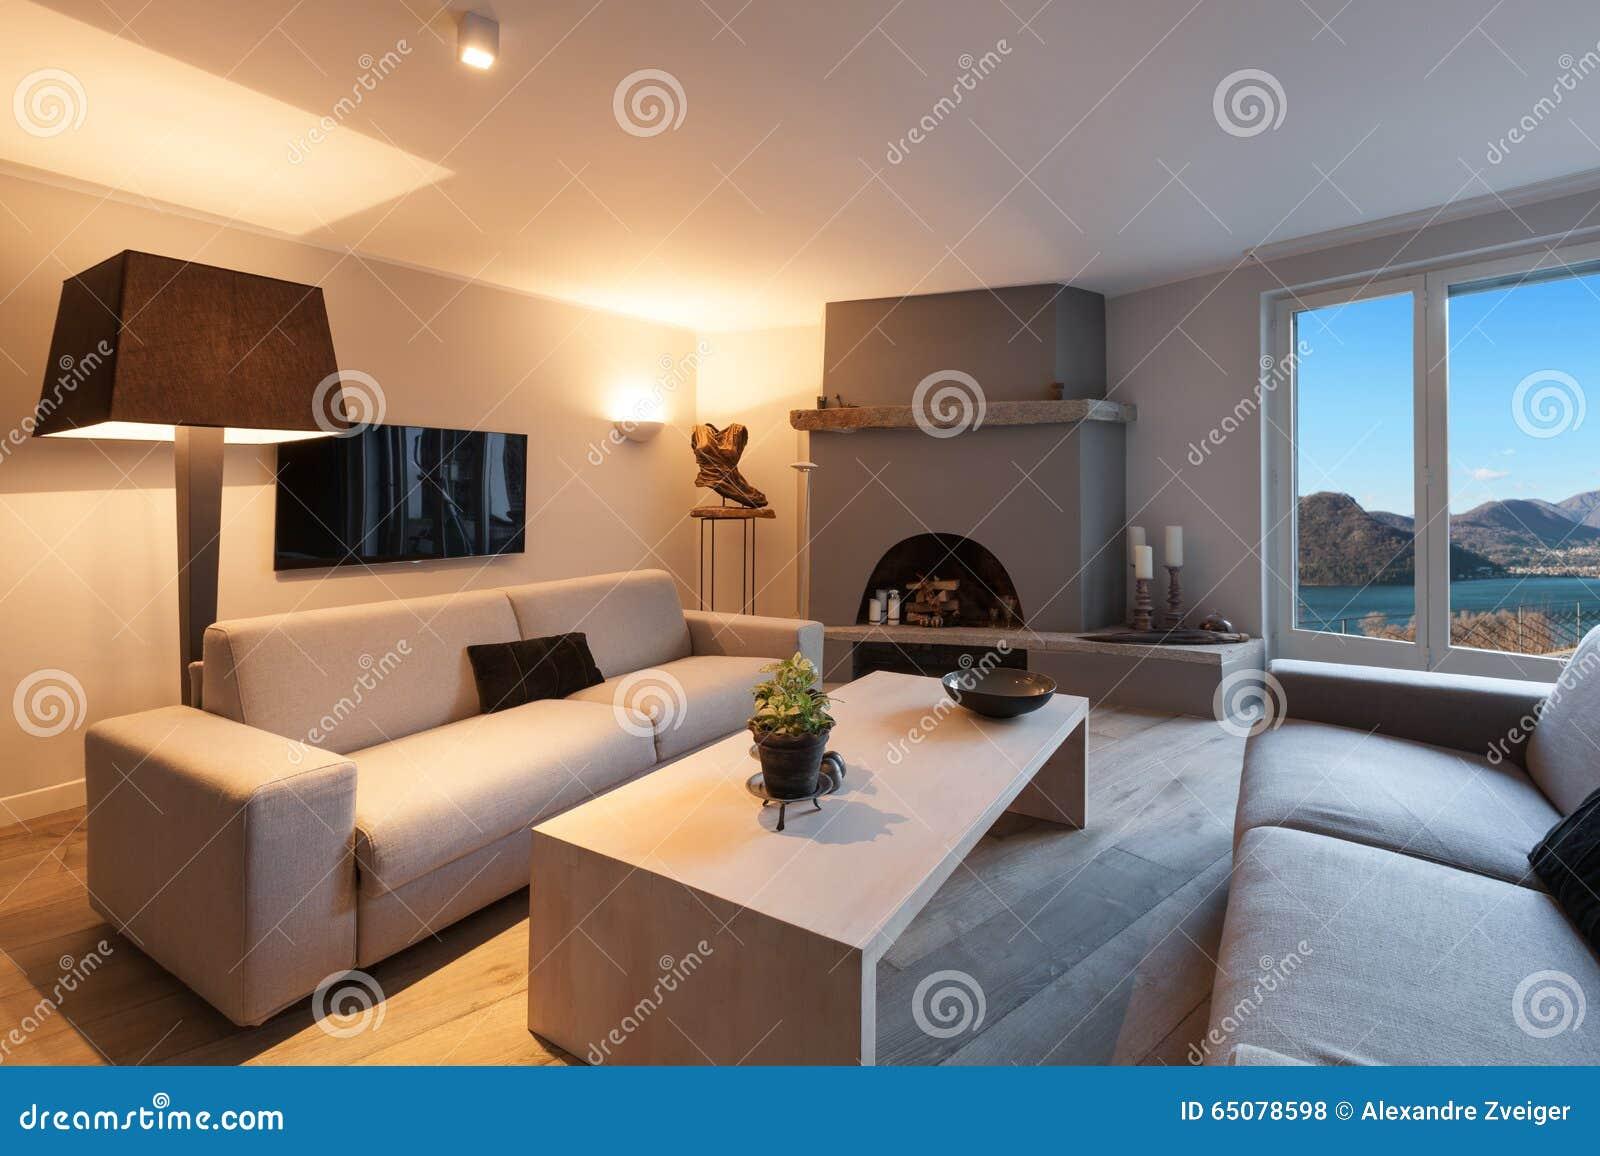 Interior Comfortable Living Room Stock Photo Image